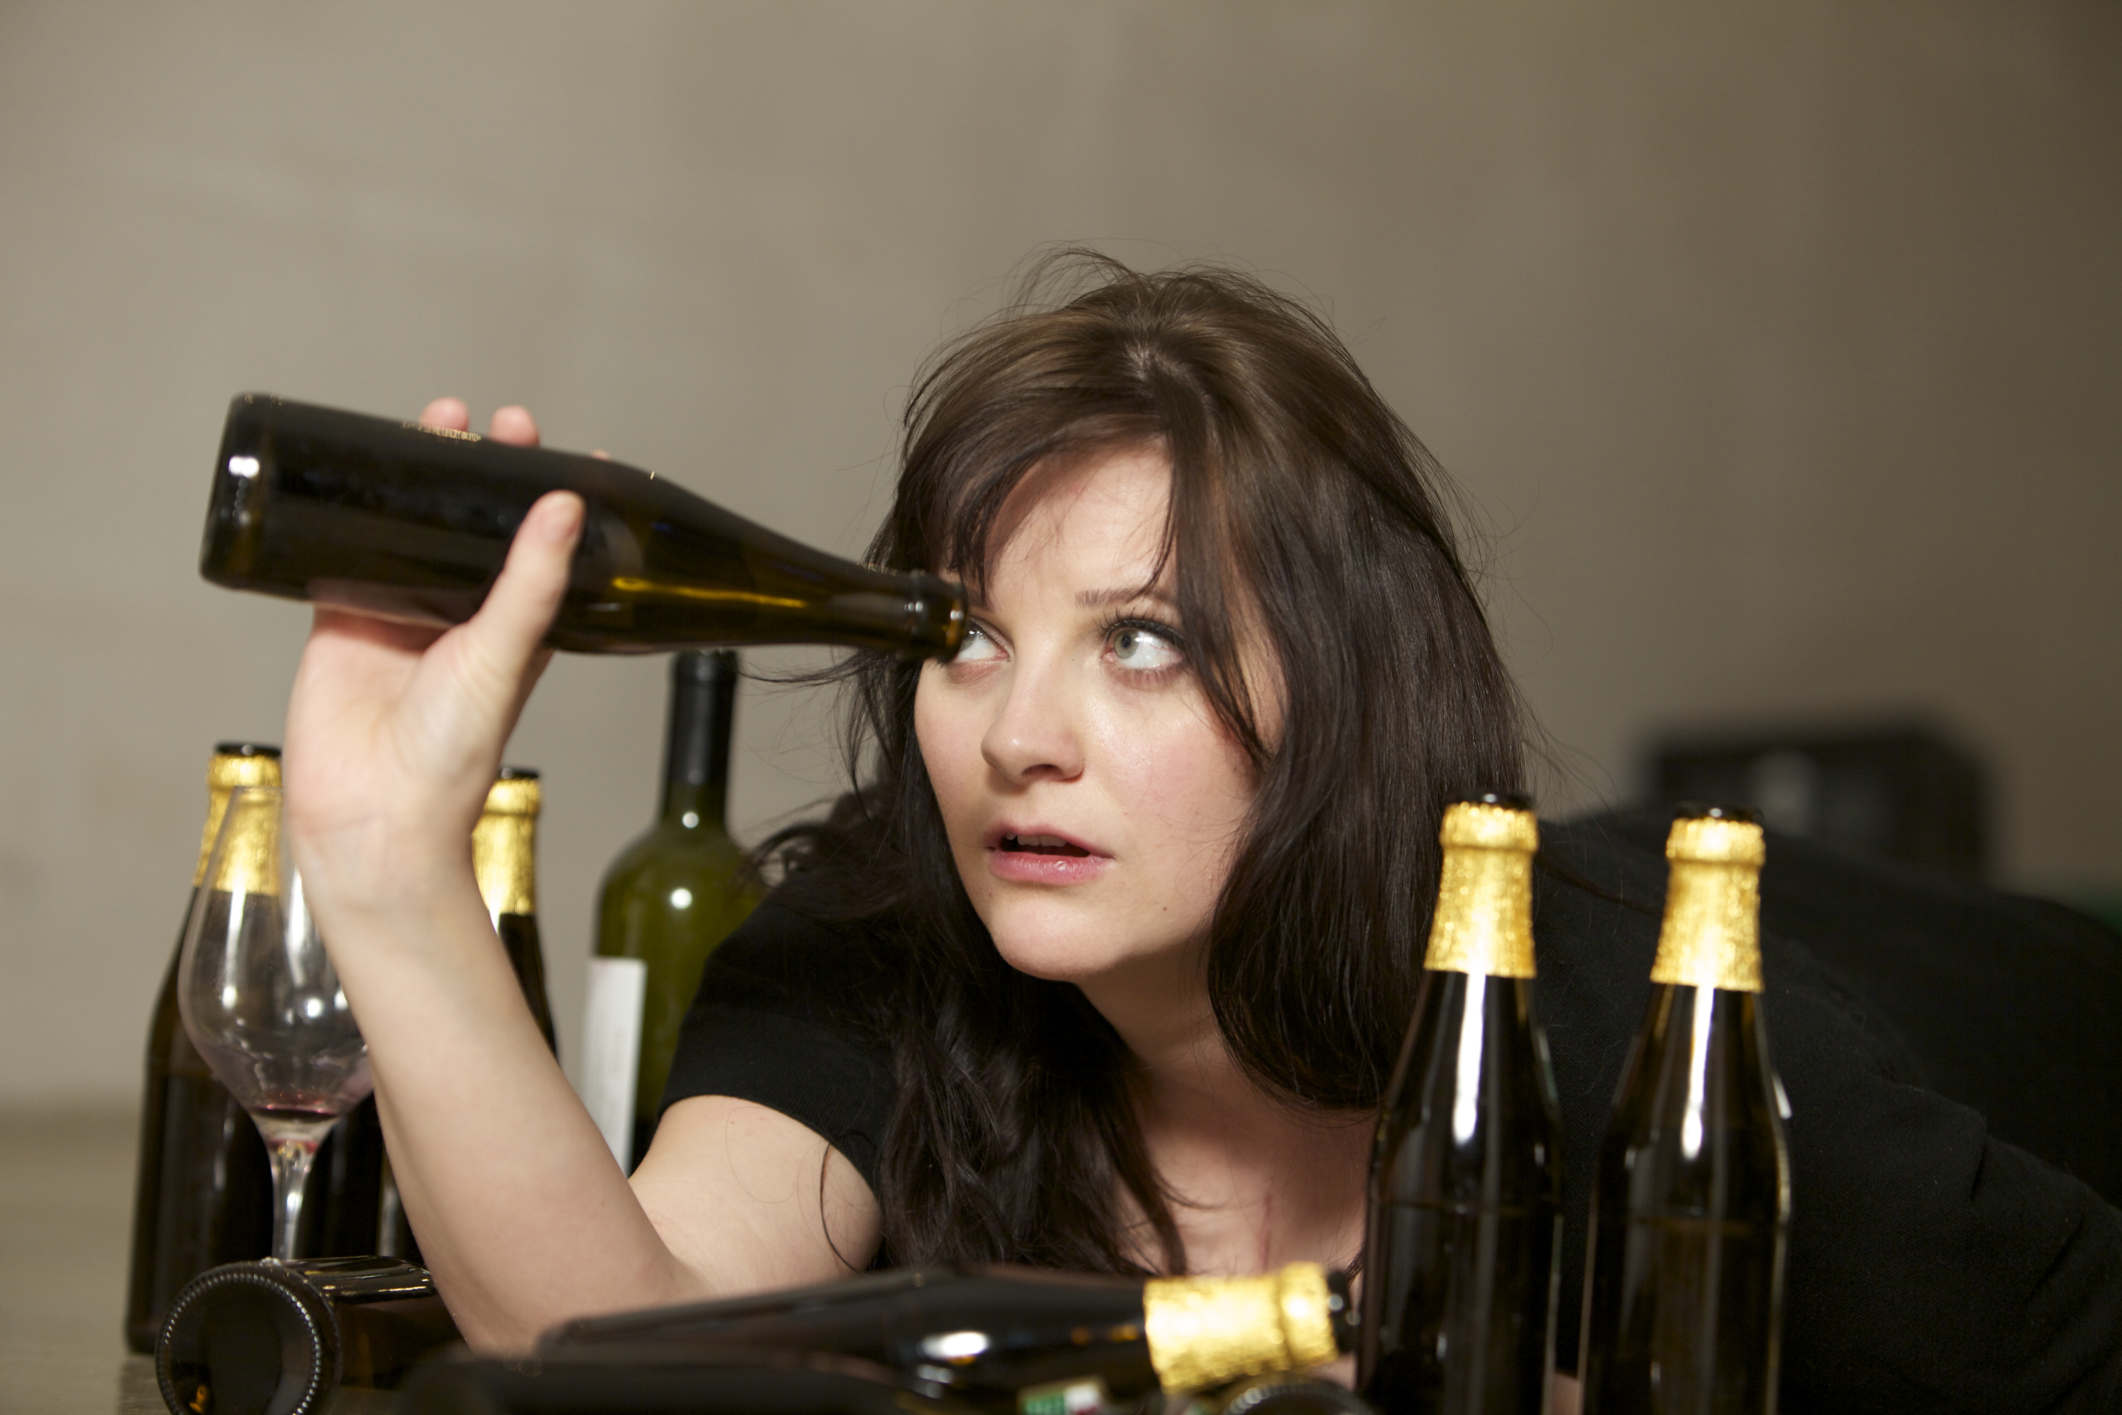 Кошечки, картинки с приколами девушки пьют